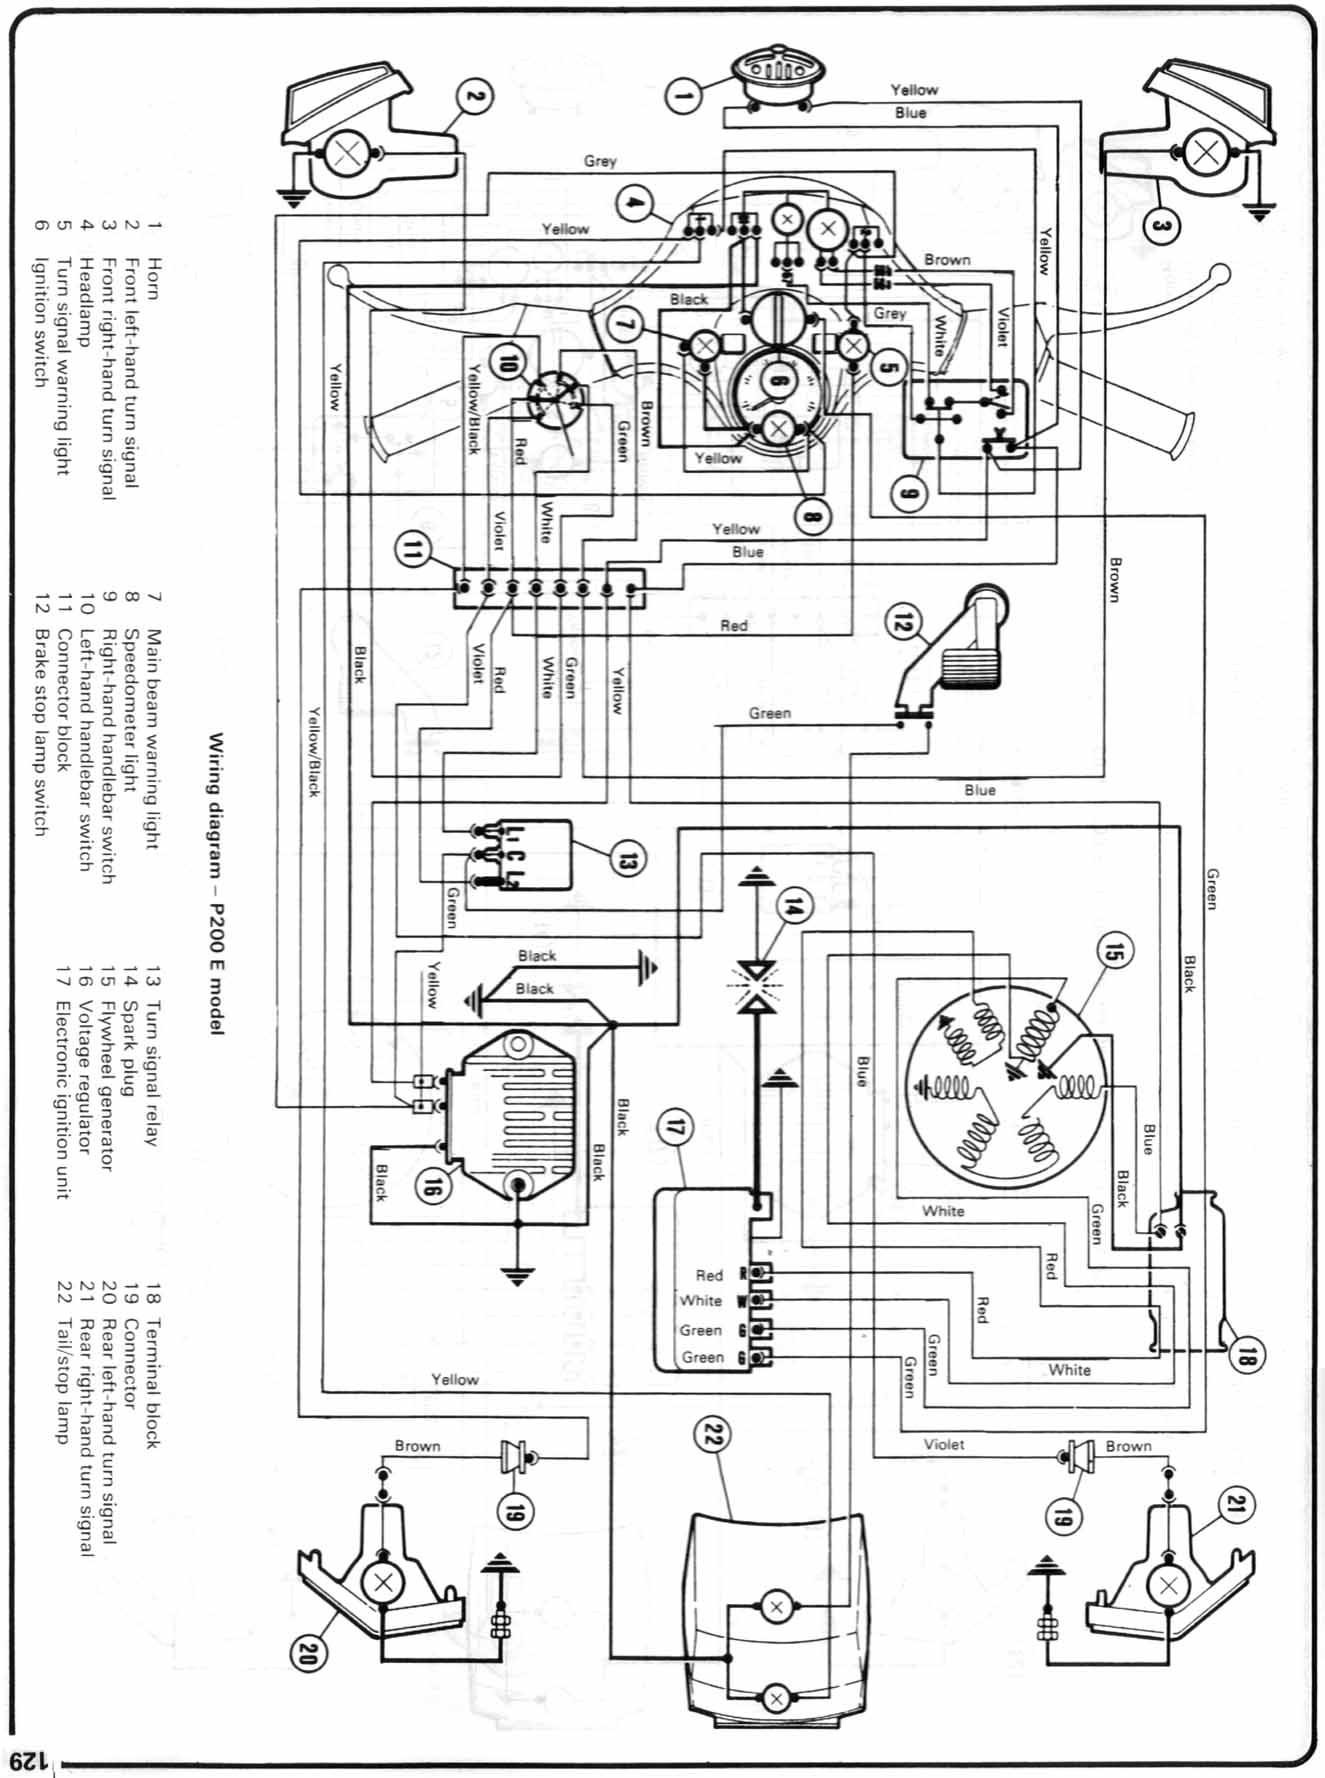 Rb Lefty Tele Wiring Diagram Download Diagram